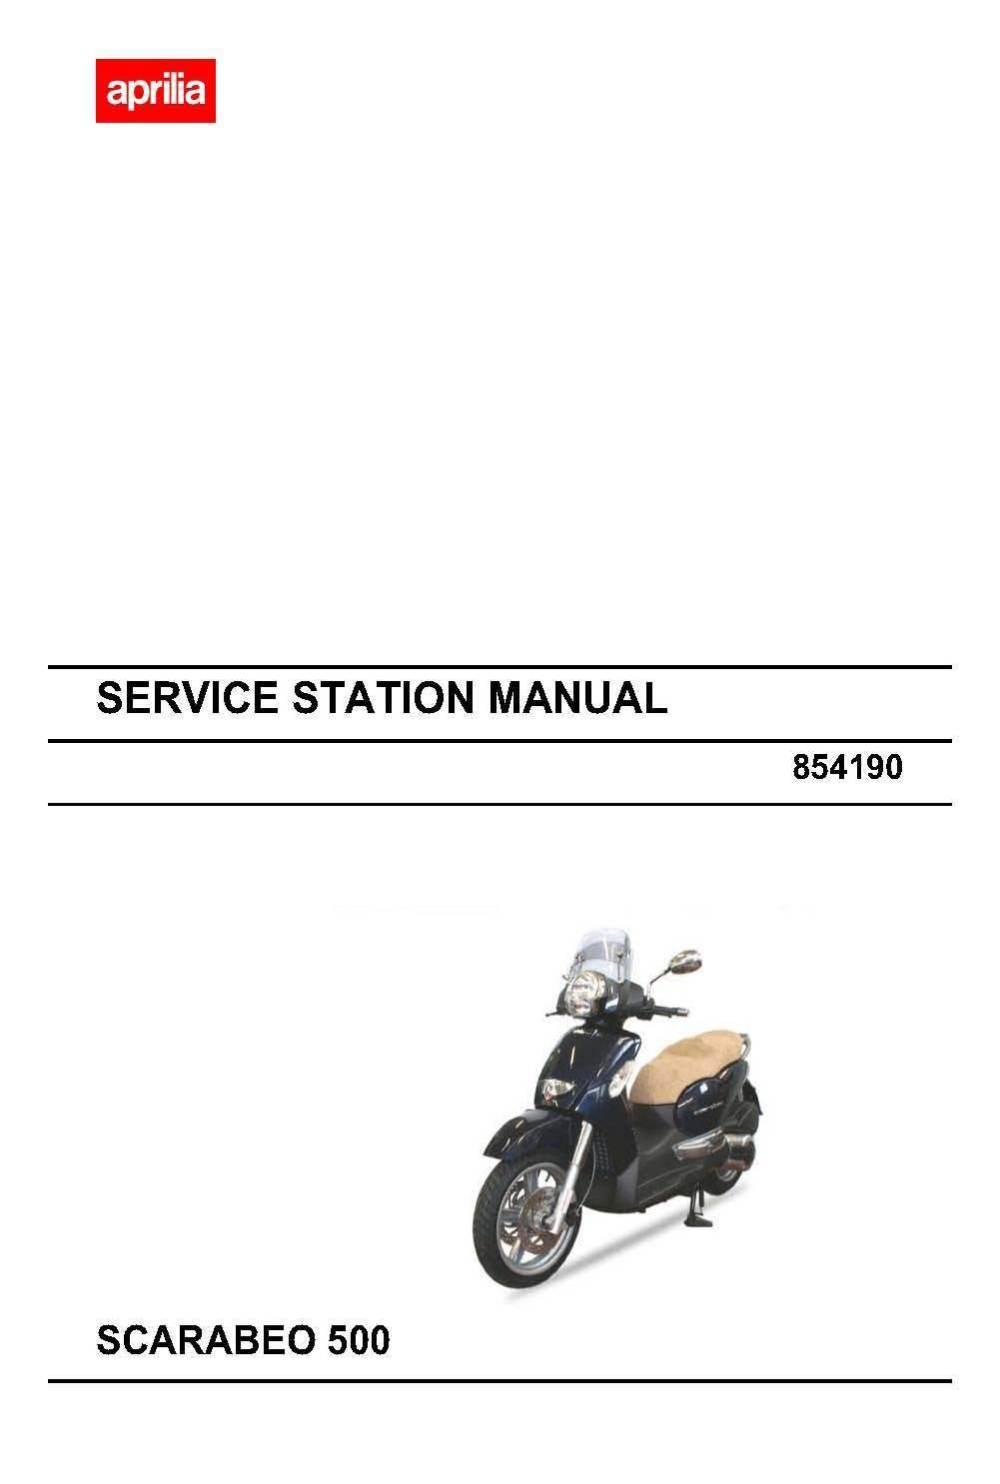 medium resolution of norton secured powered by verisign aprilia service workshop manual 2006 scarabeo 500